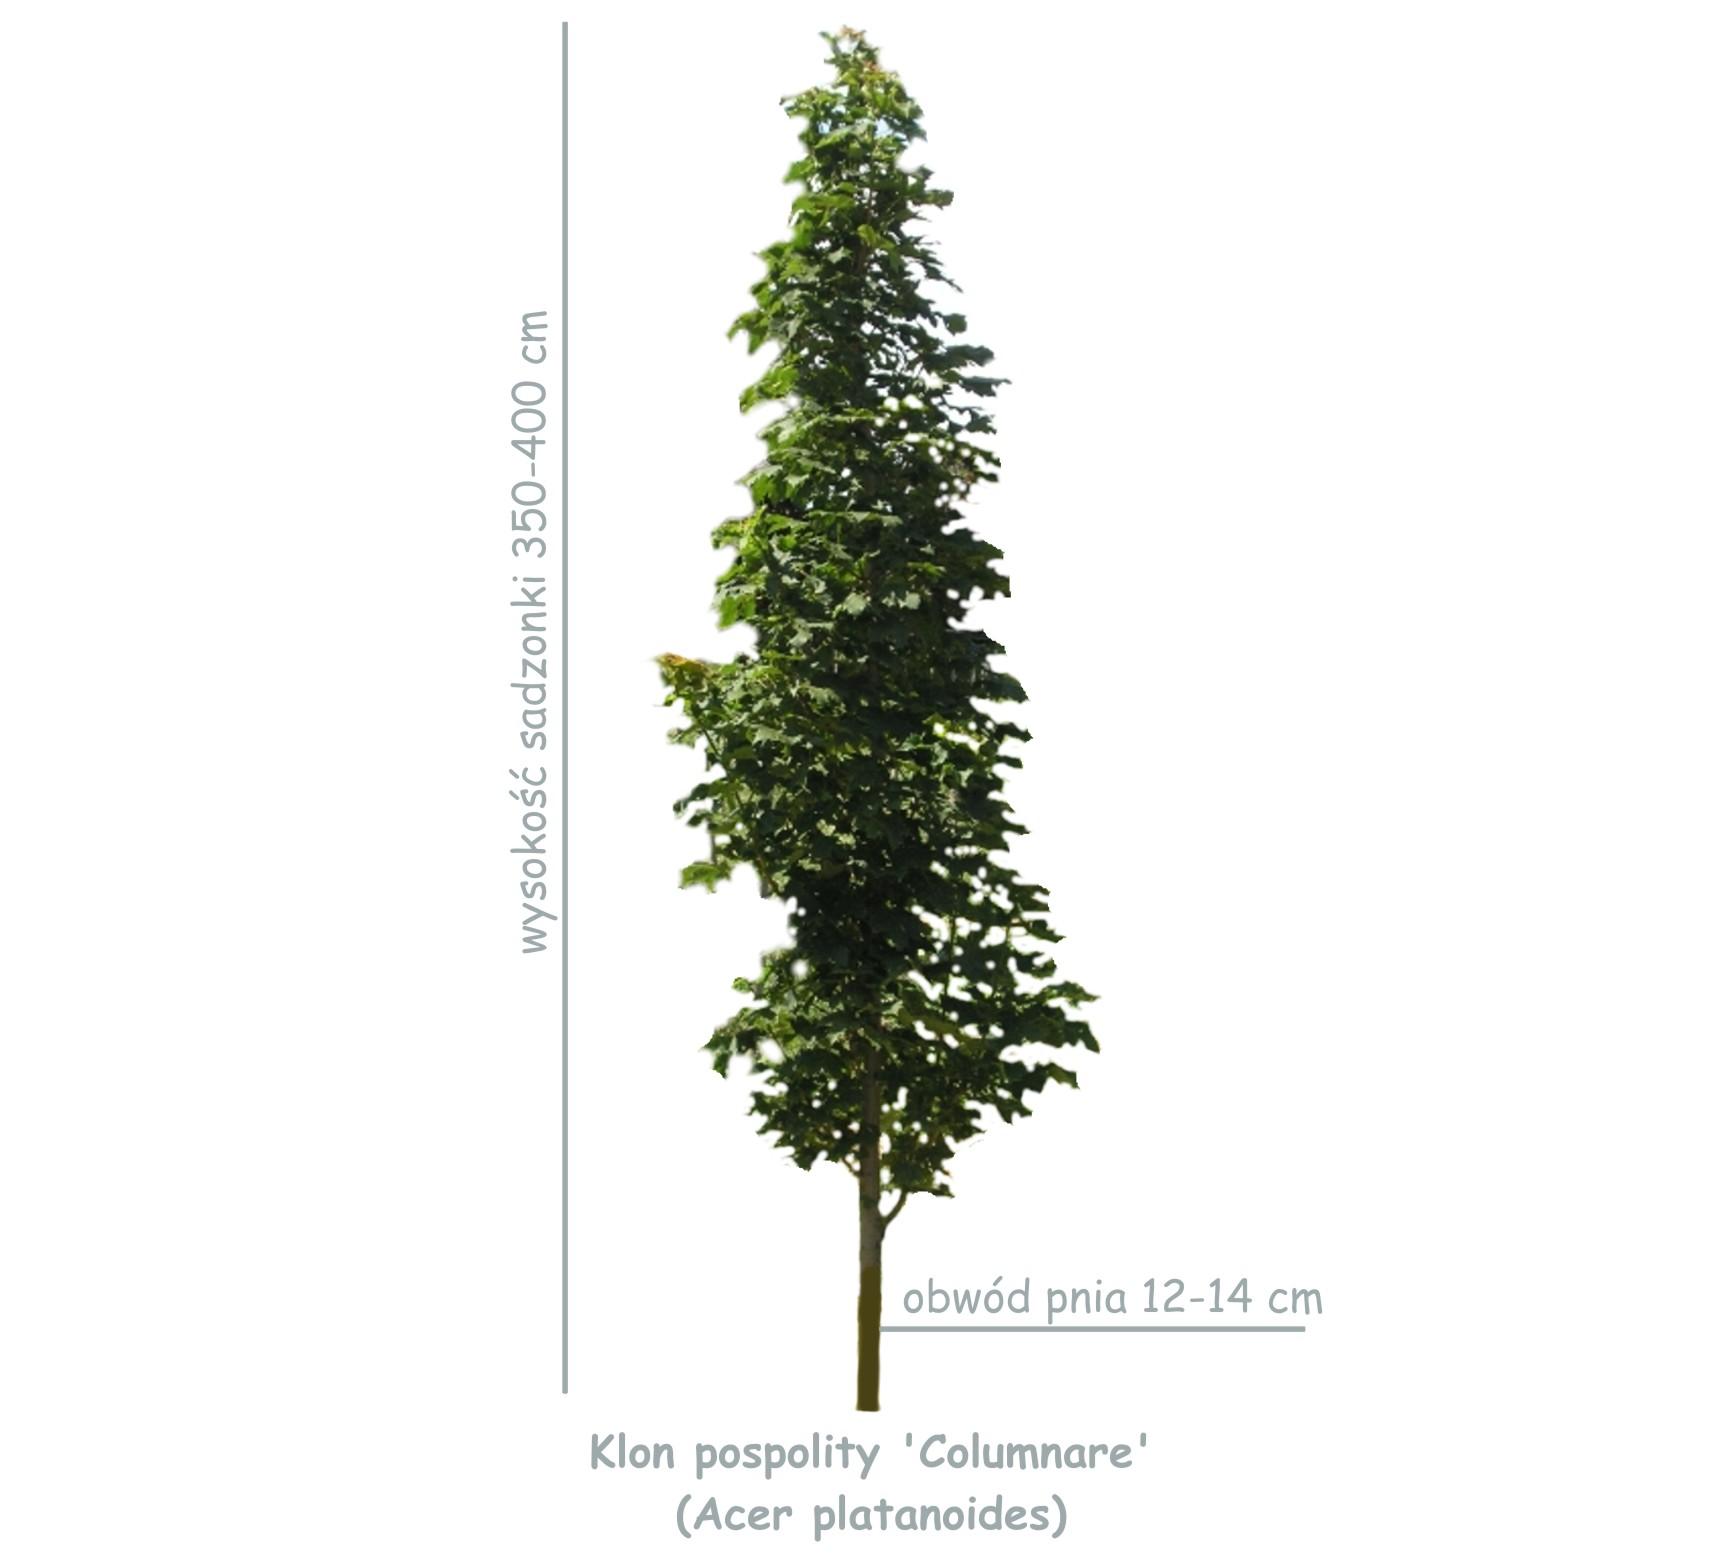 Klon pospolity 'Columnare' (Acer platanoides) sadzonka o obwodzie 12-14 cm